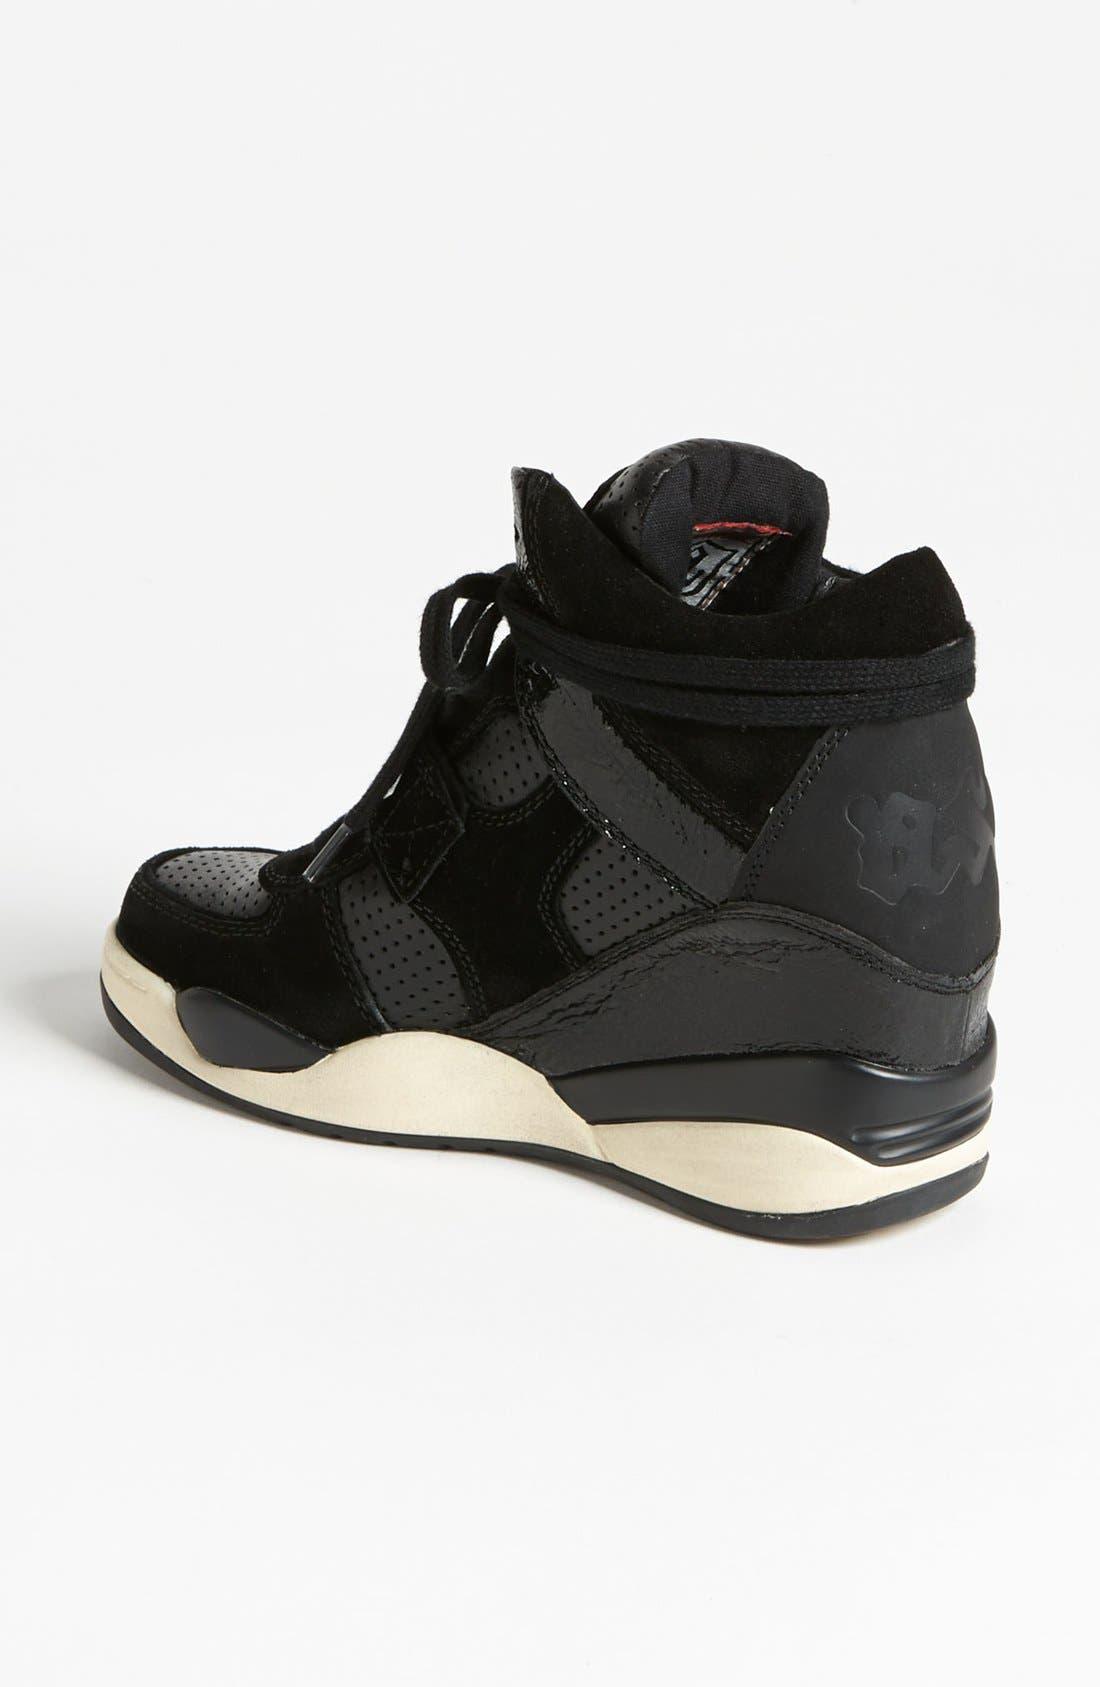 Alternate Image 2  - Ash 'Funky Ter' Sneaker (Nordstrom Exclusive)